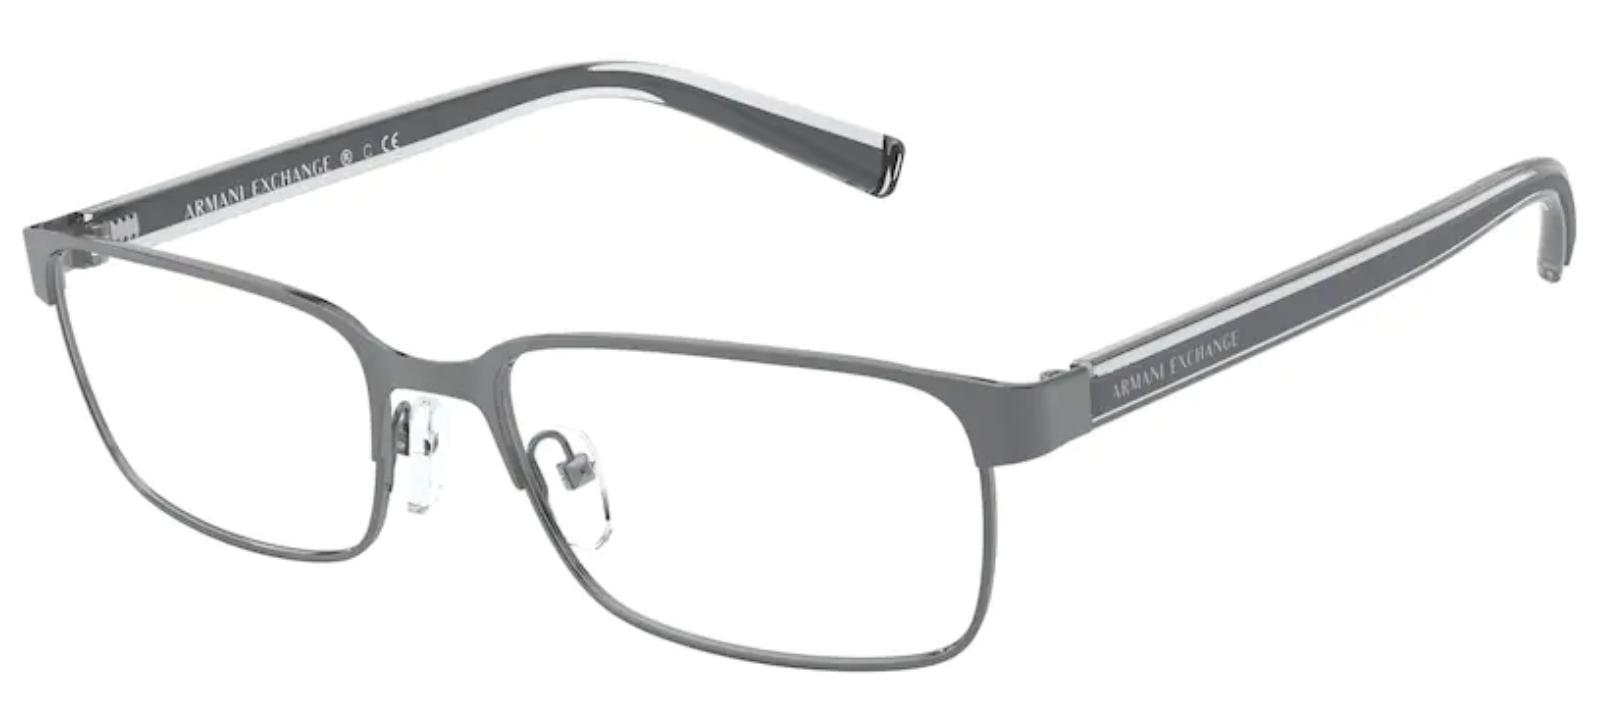 Óculos de Grau Armani Exchange Masculino AX 1042 6006 Tam.56